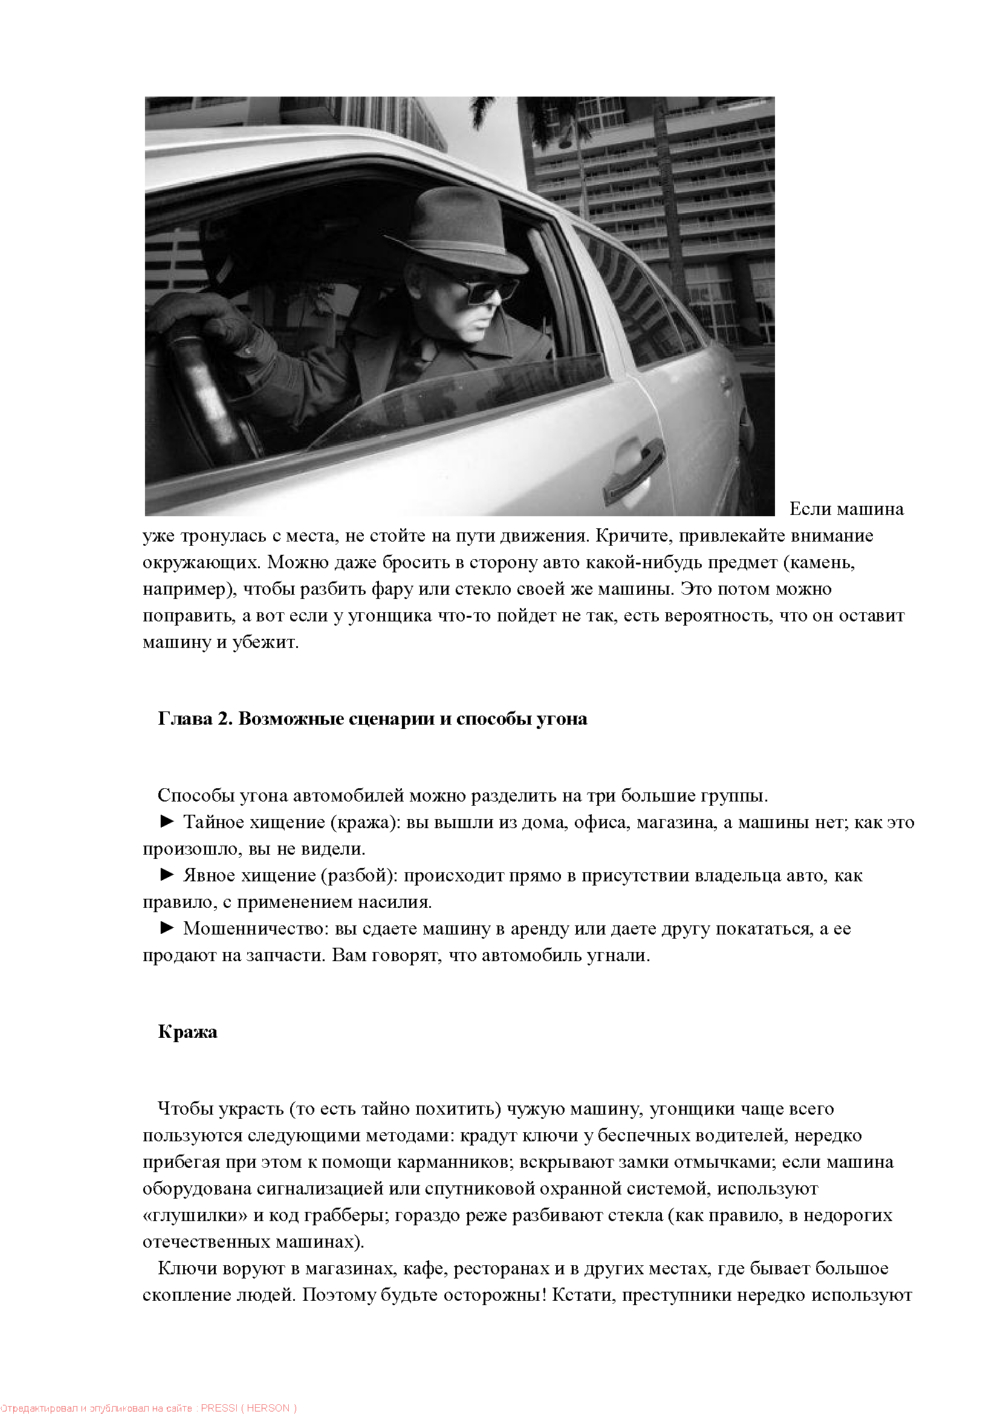 http://i4.imageban.ru/out/2013/12/05/69fac11f8151980c2d7785e7eb8af929.jpg